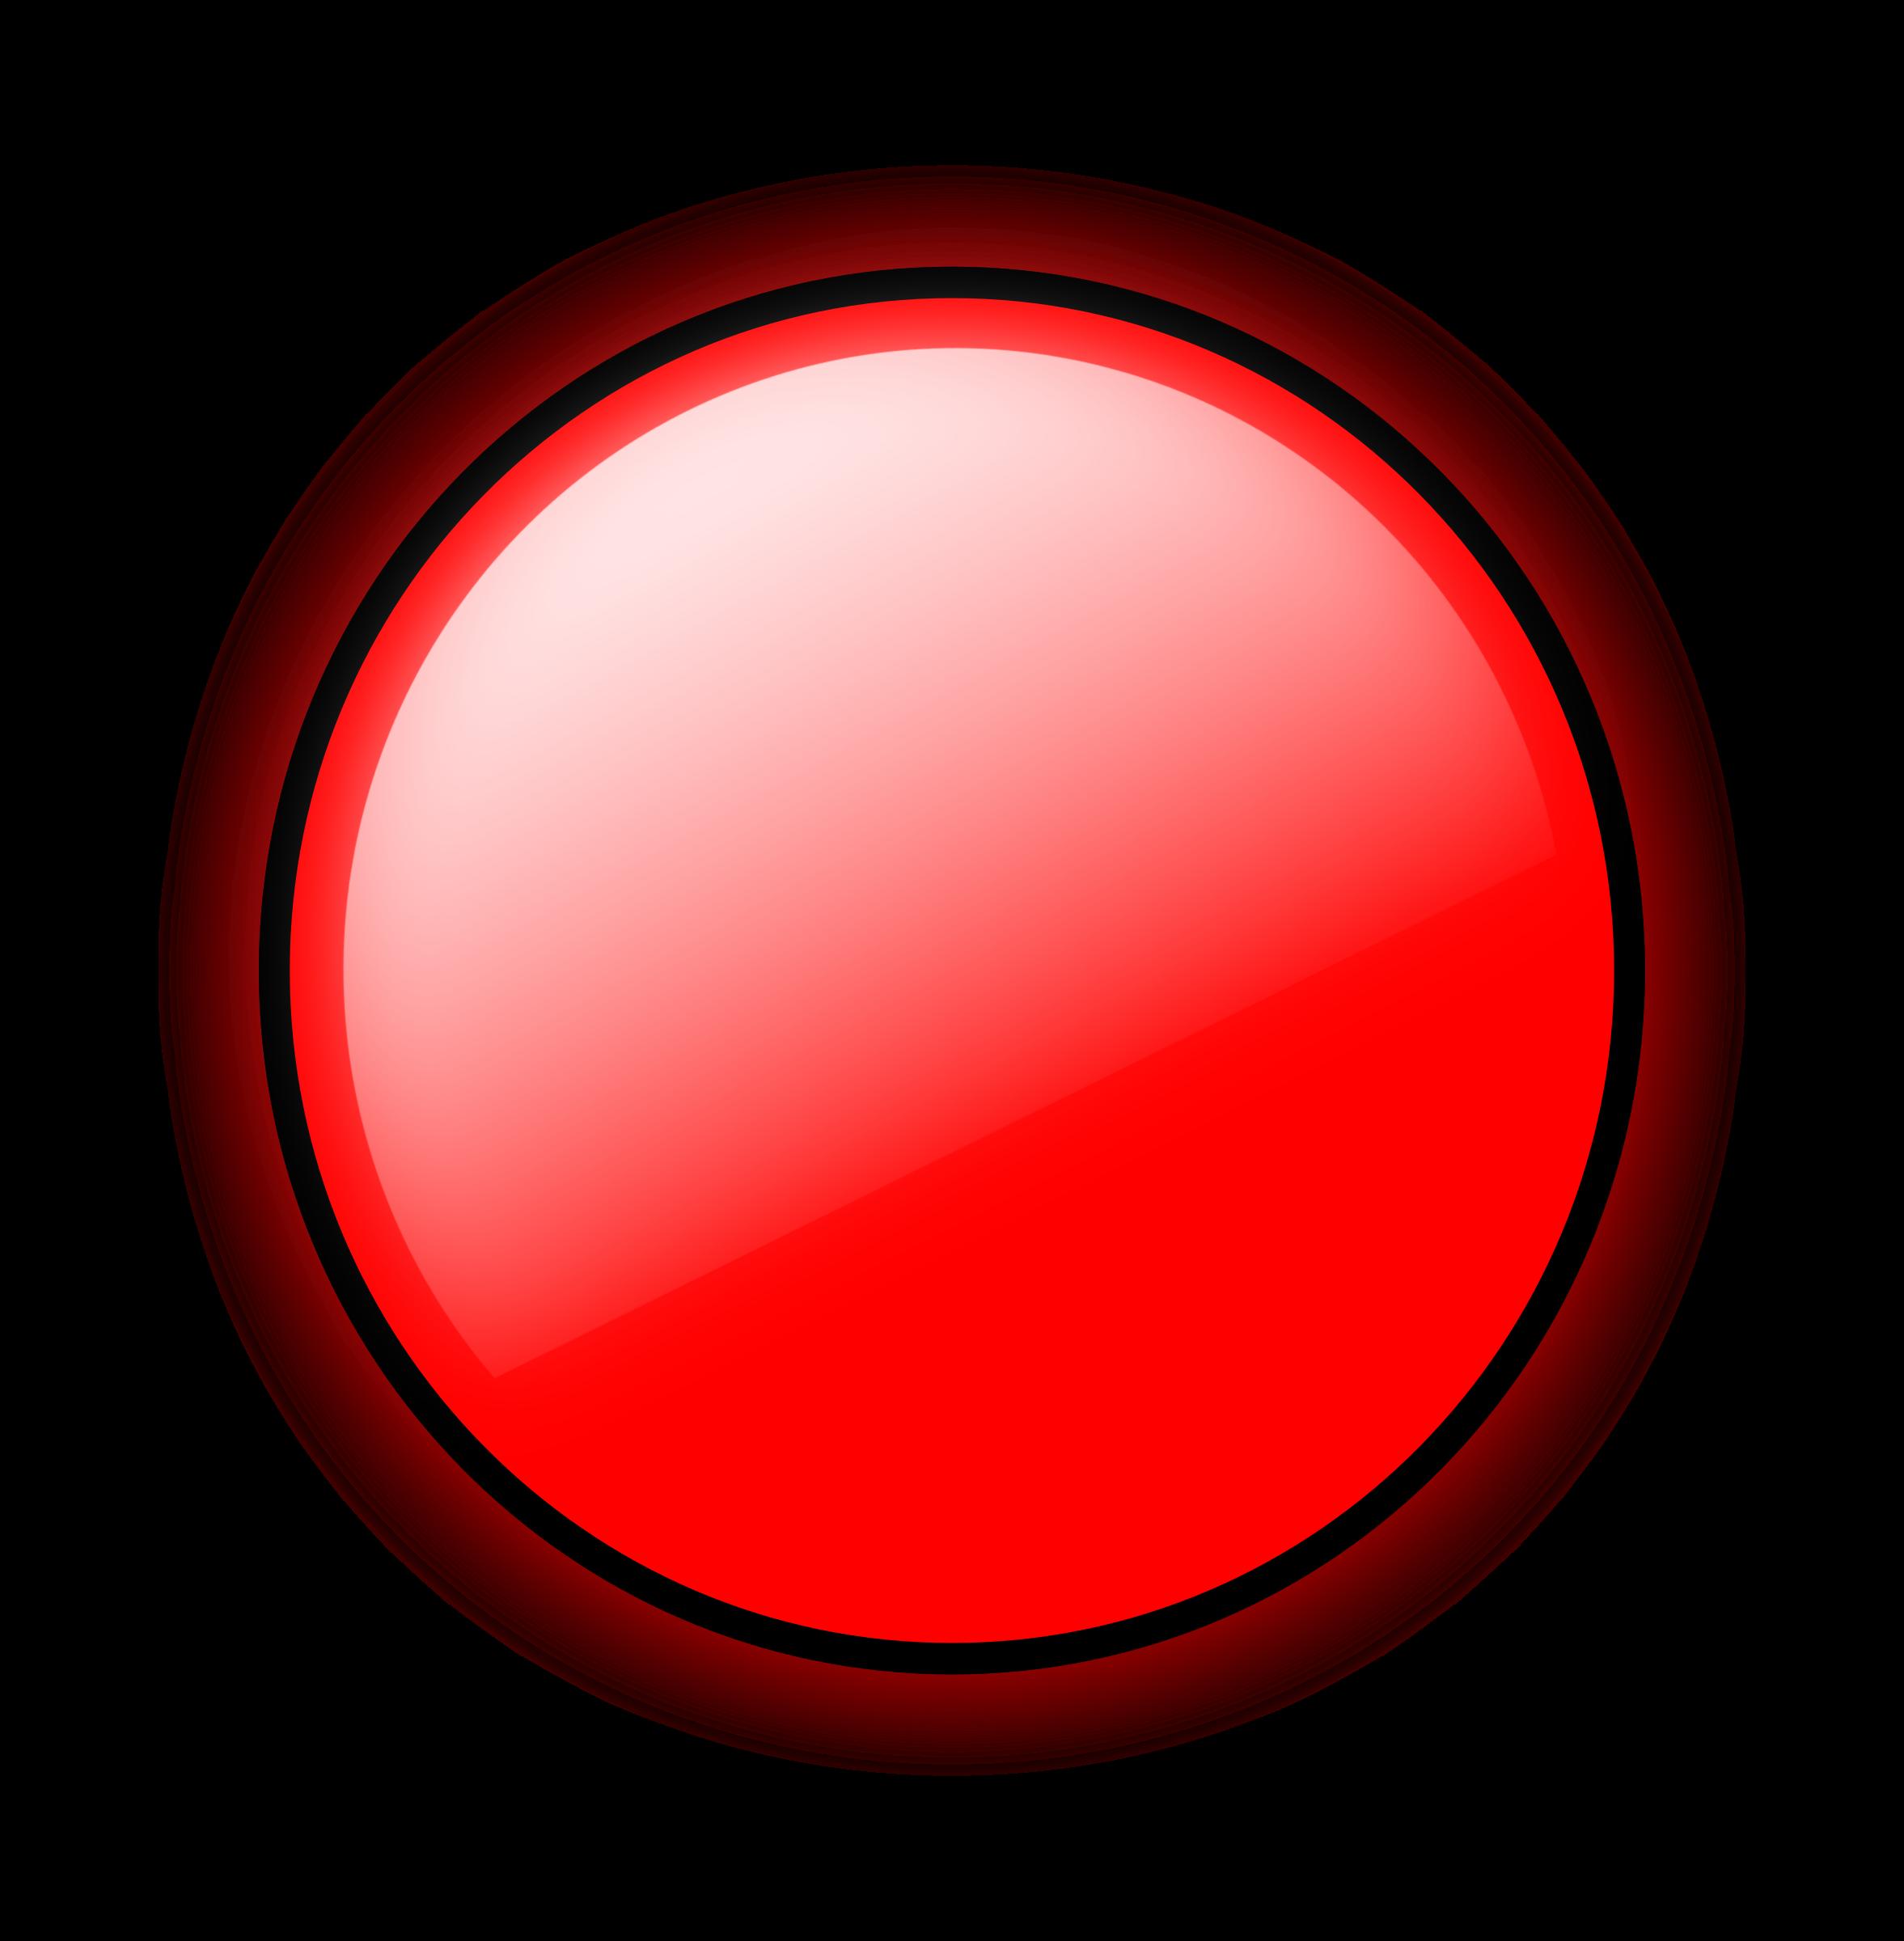 Big image png. Circle clipart red